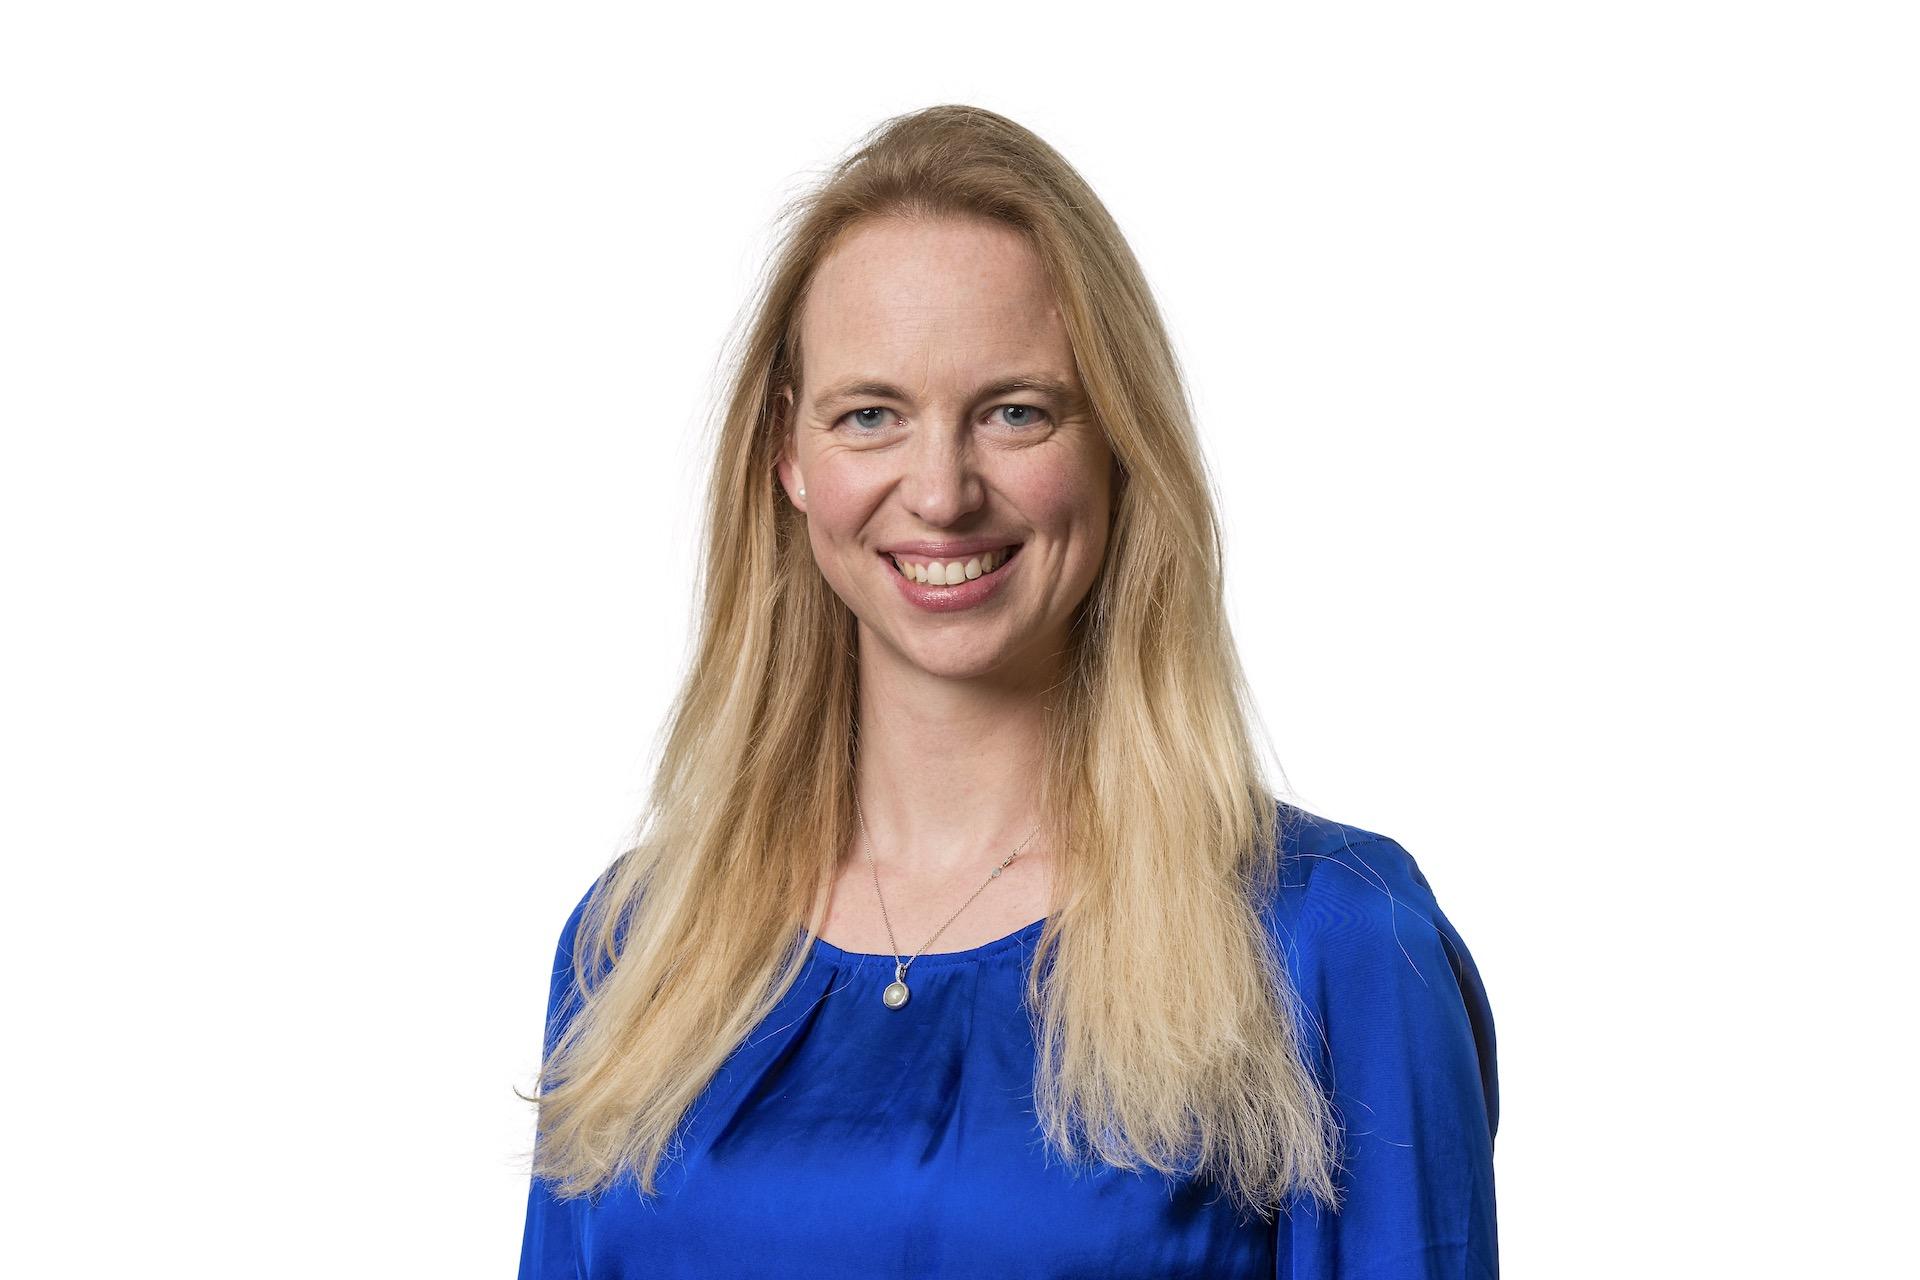 Marianne de Boer Doeves van VVD